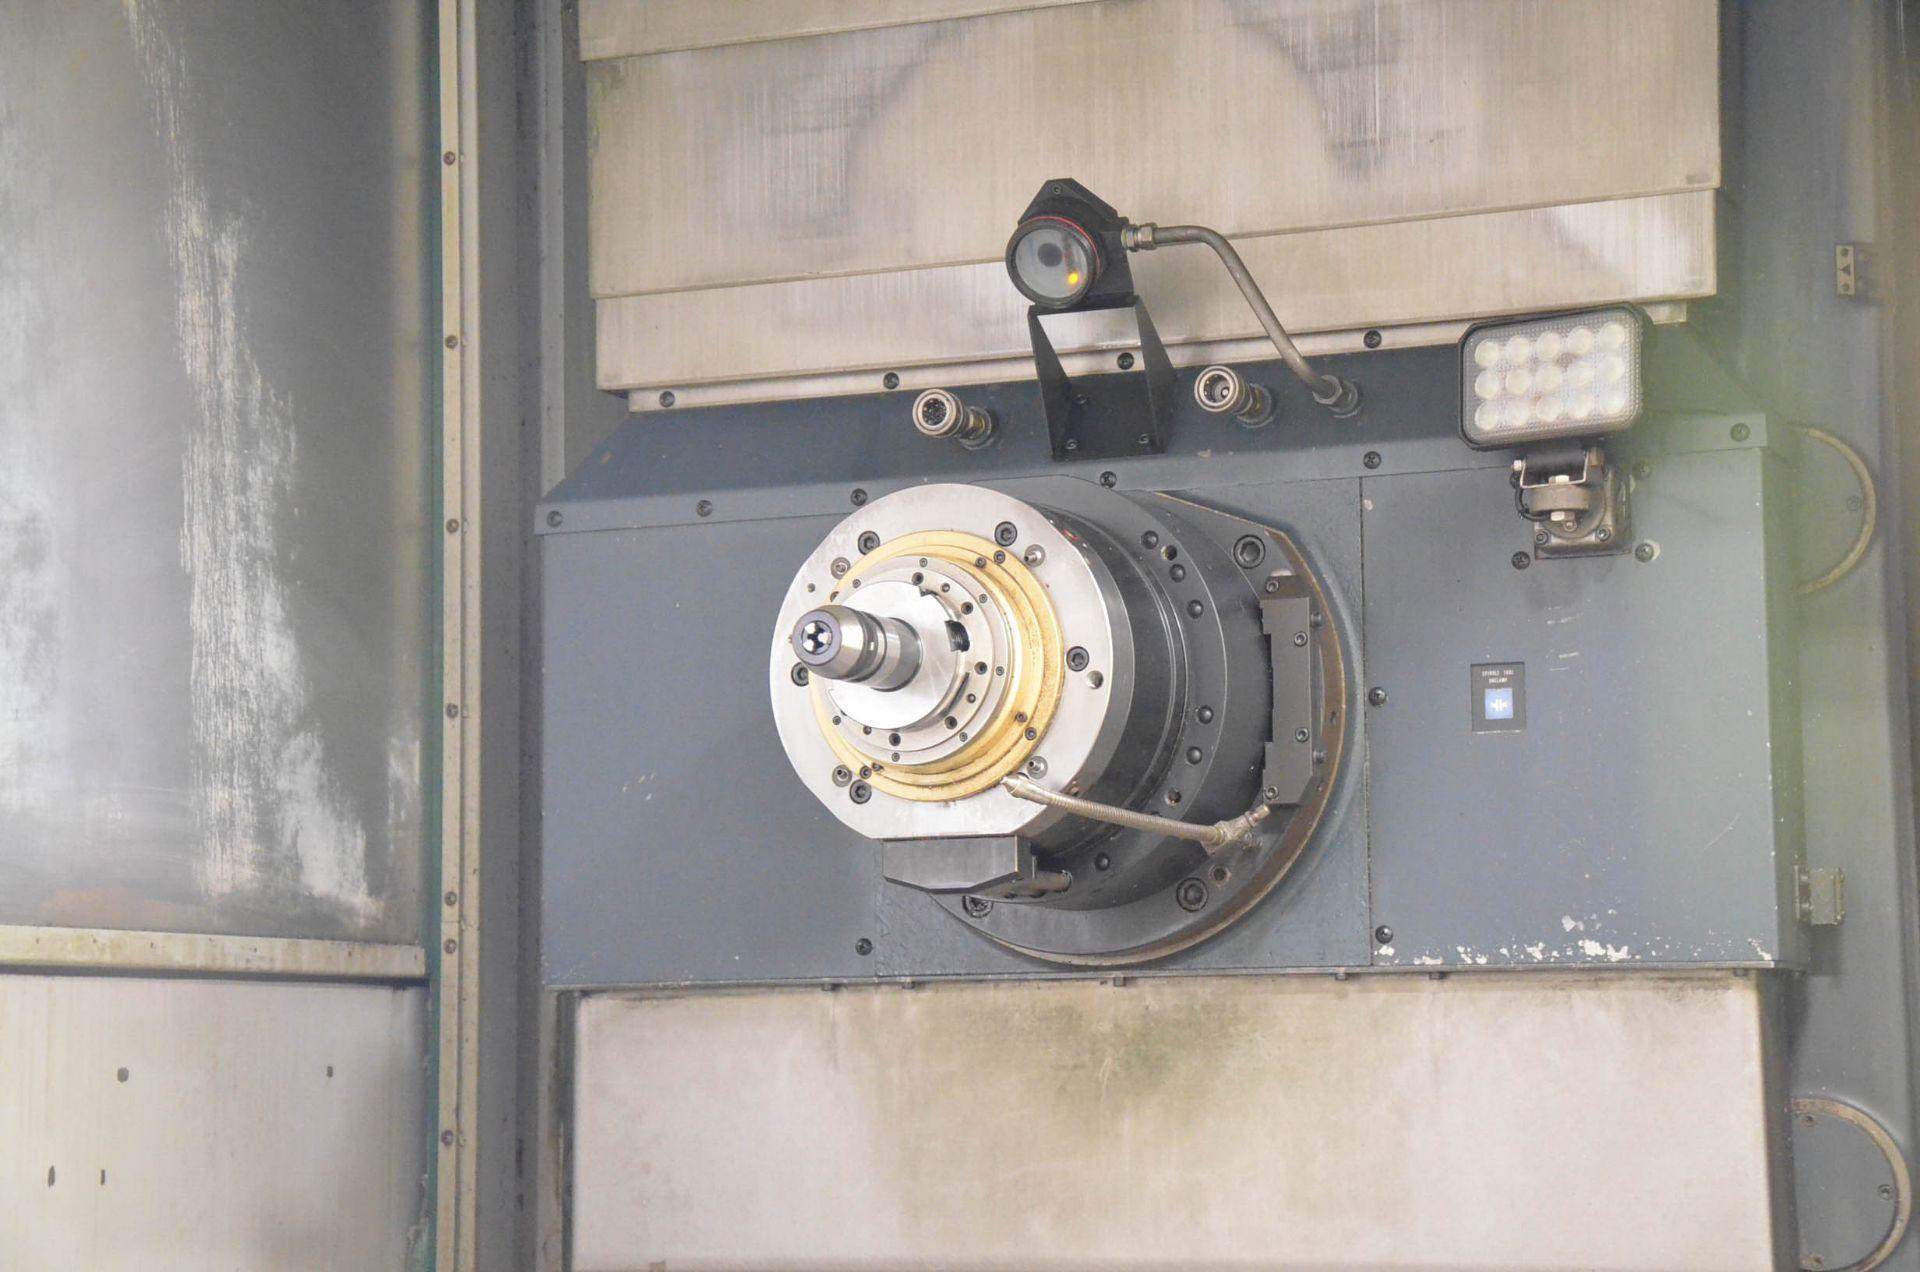 MAKINO (2008) MCC2013 4-AXIS HORIZONTAL MACHINING CENTER WITH MAKINO PROFESSIONAL 5 CNC CONTROL, - Image 12 of 12